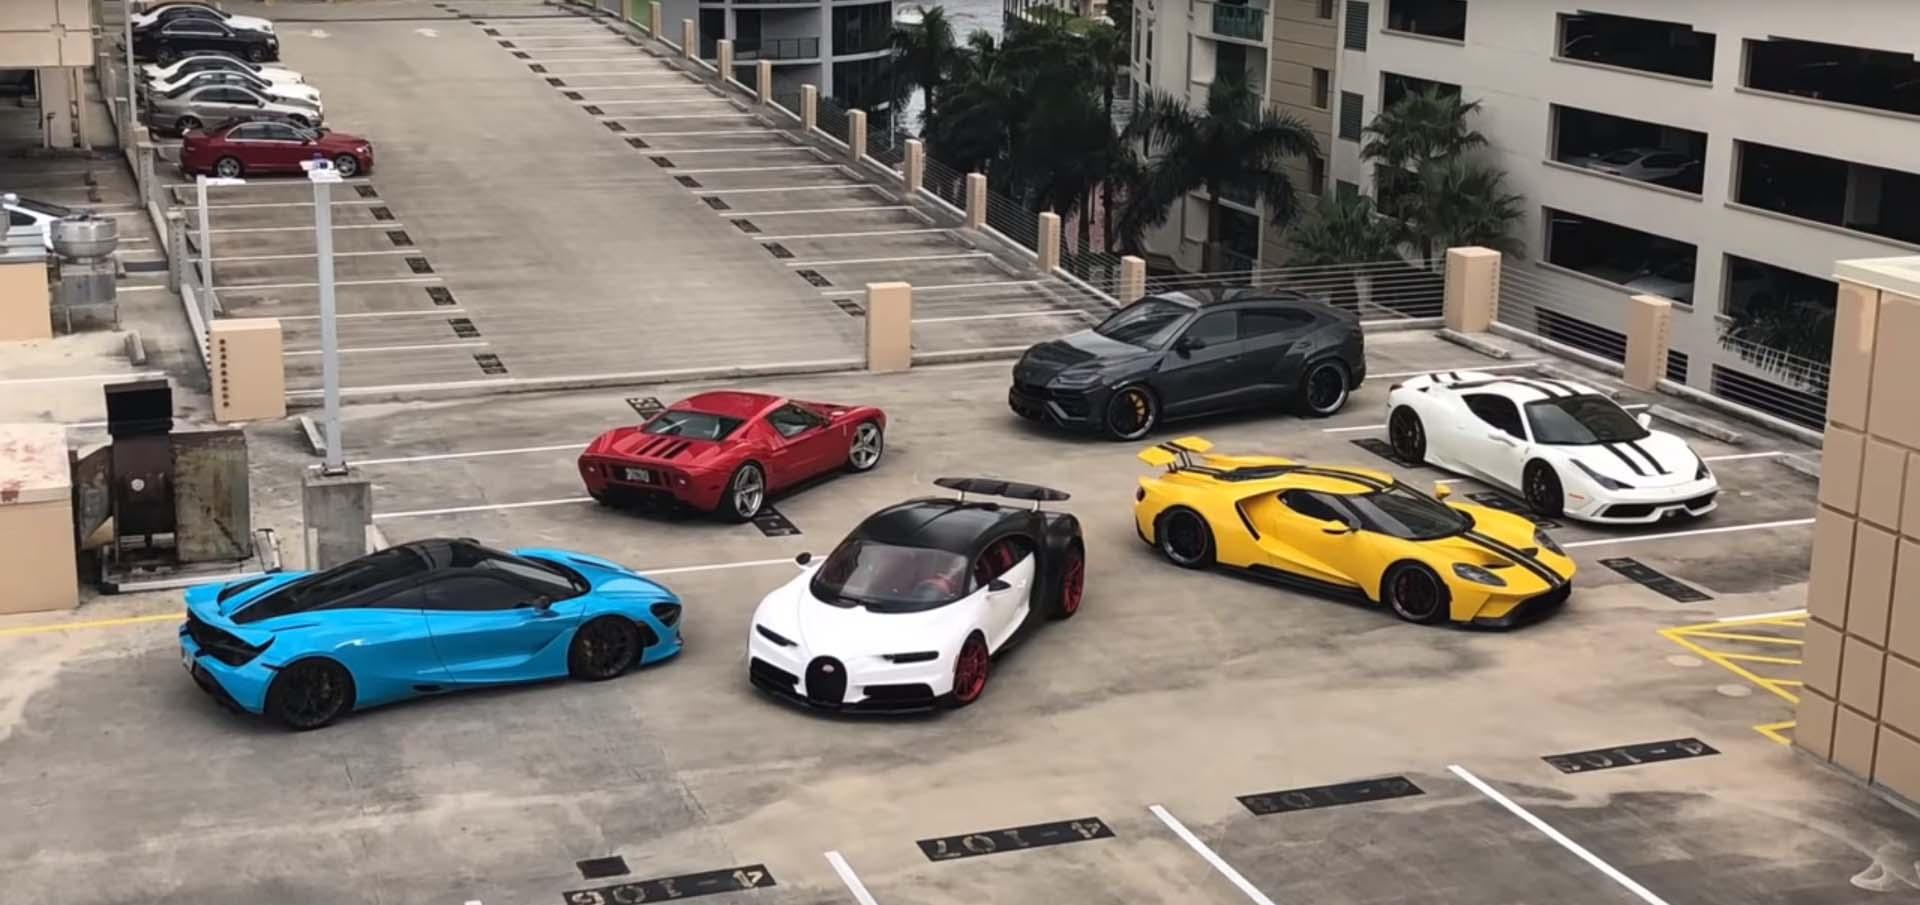 Битка од 6 милиони долари – кој суперавтомобил има најдобар звук? / ВИДЕО